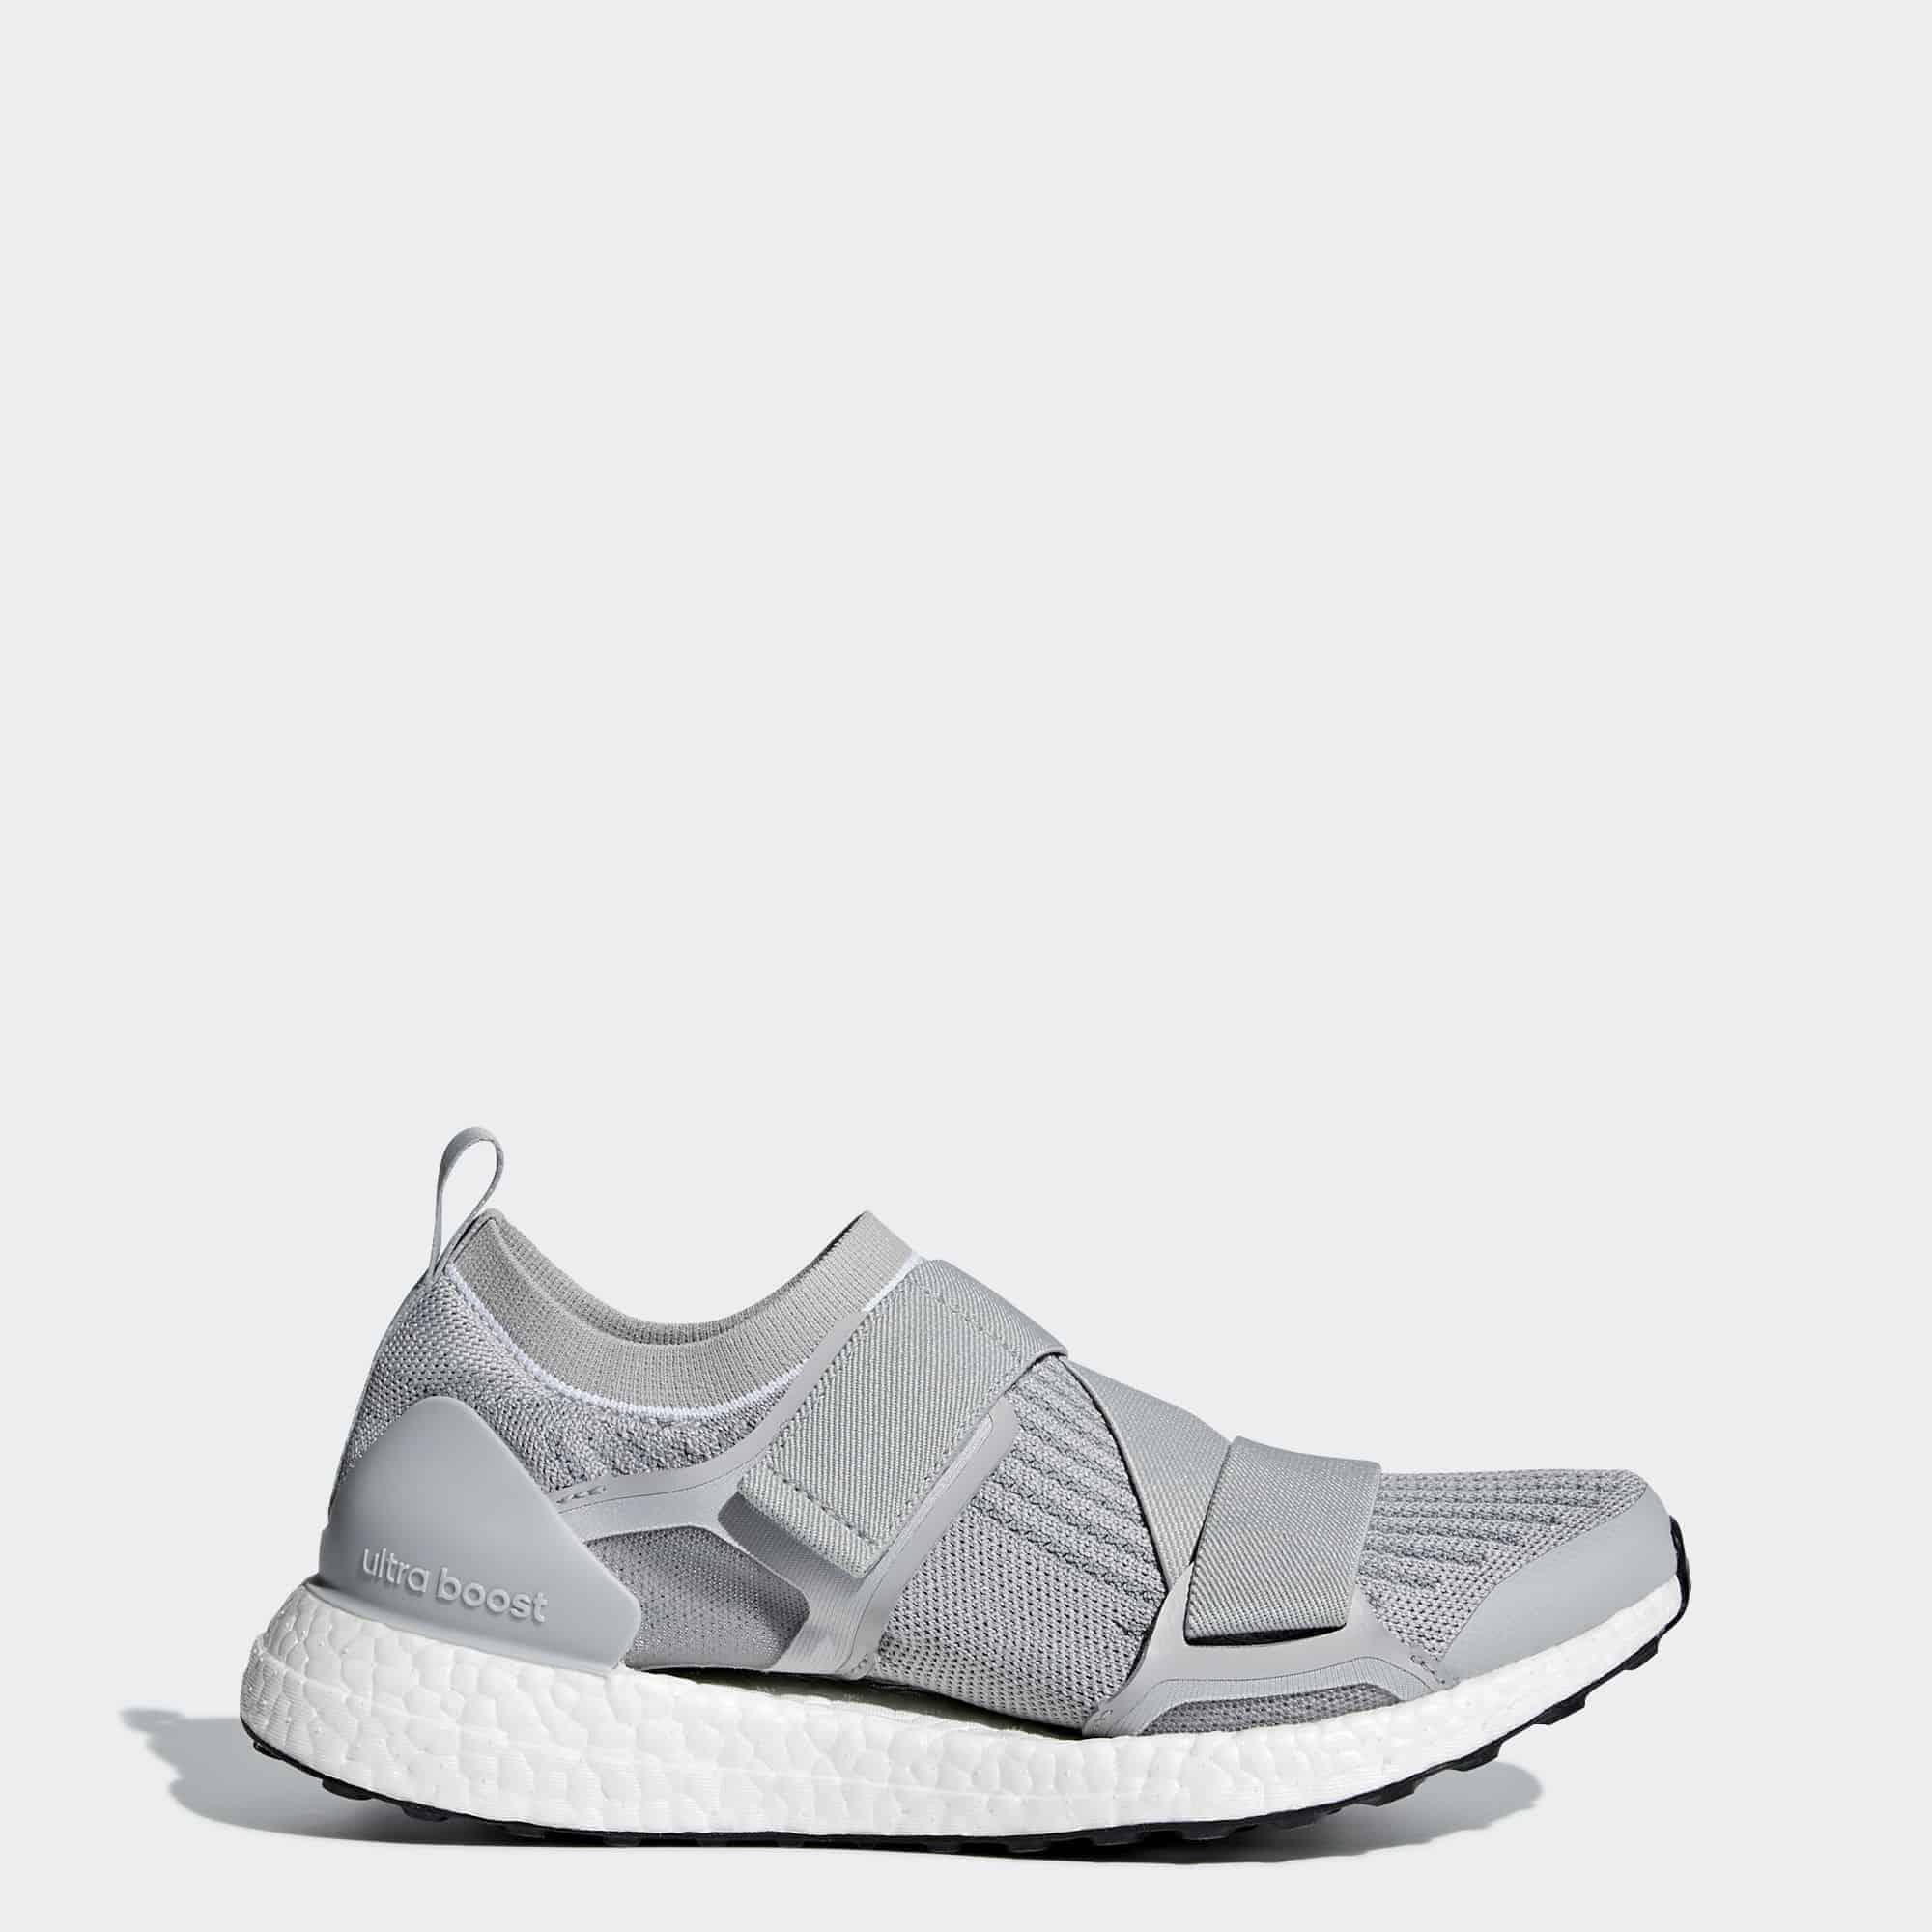 Кроссовки для бега Adidas Ultraboost X by Stella McCartney женские